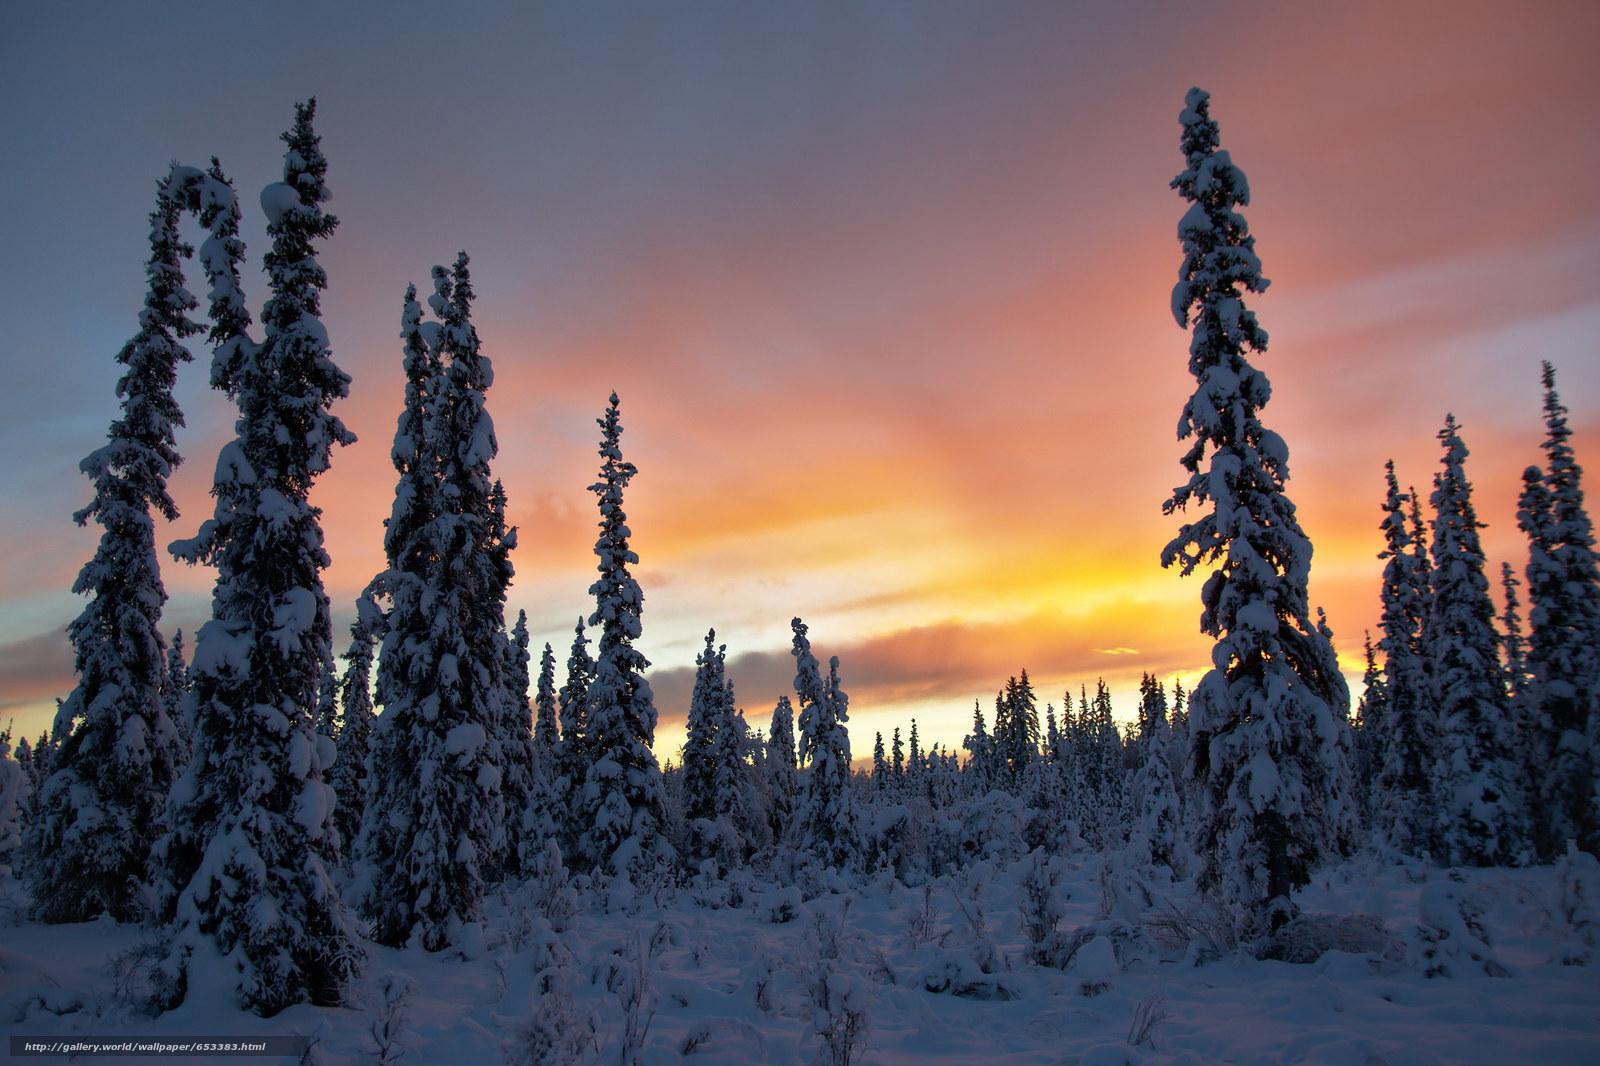 scaricare gli sfondi alaska - photo #3